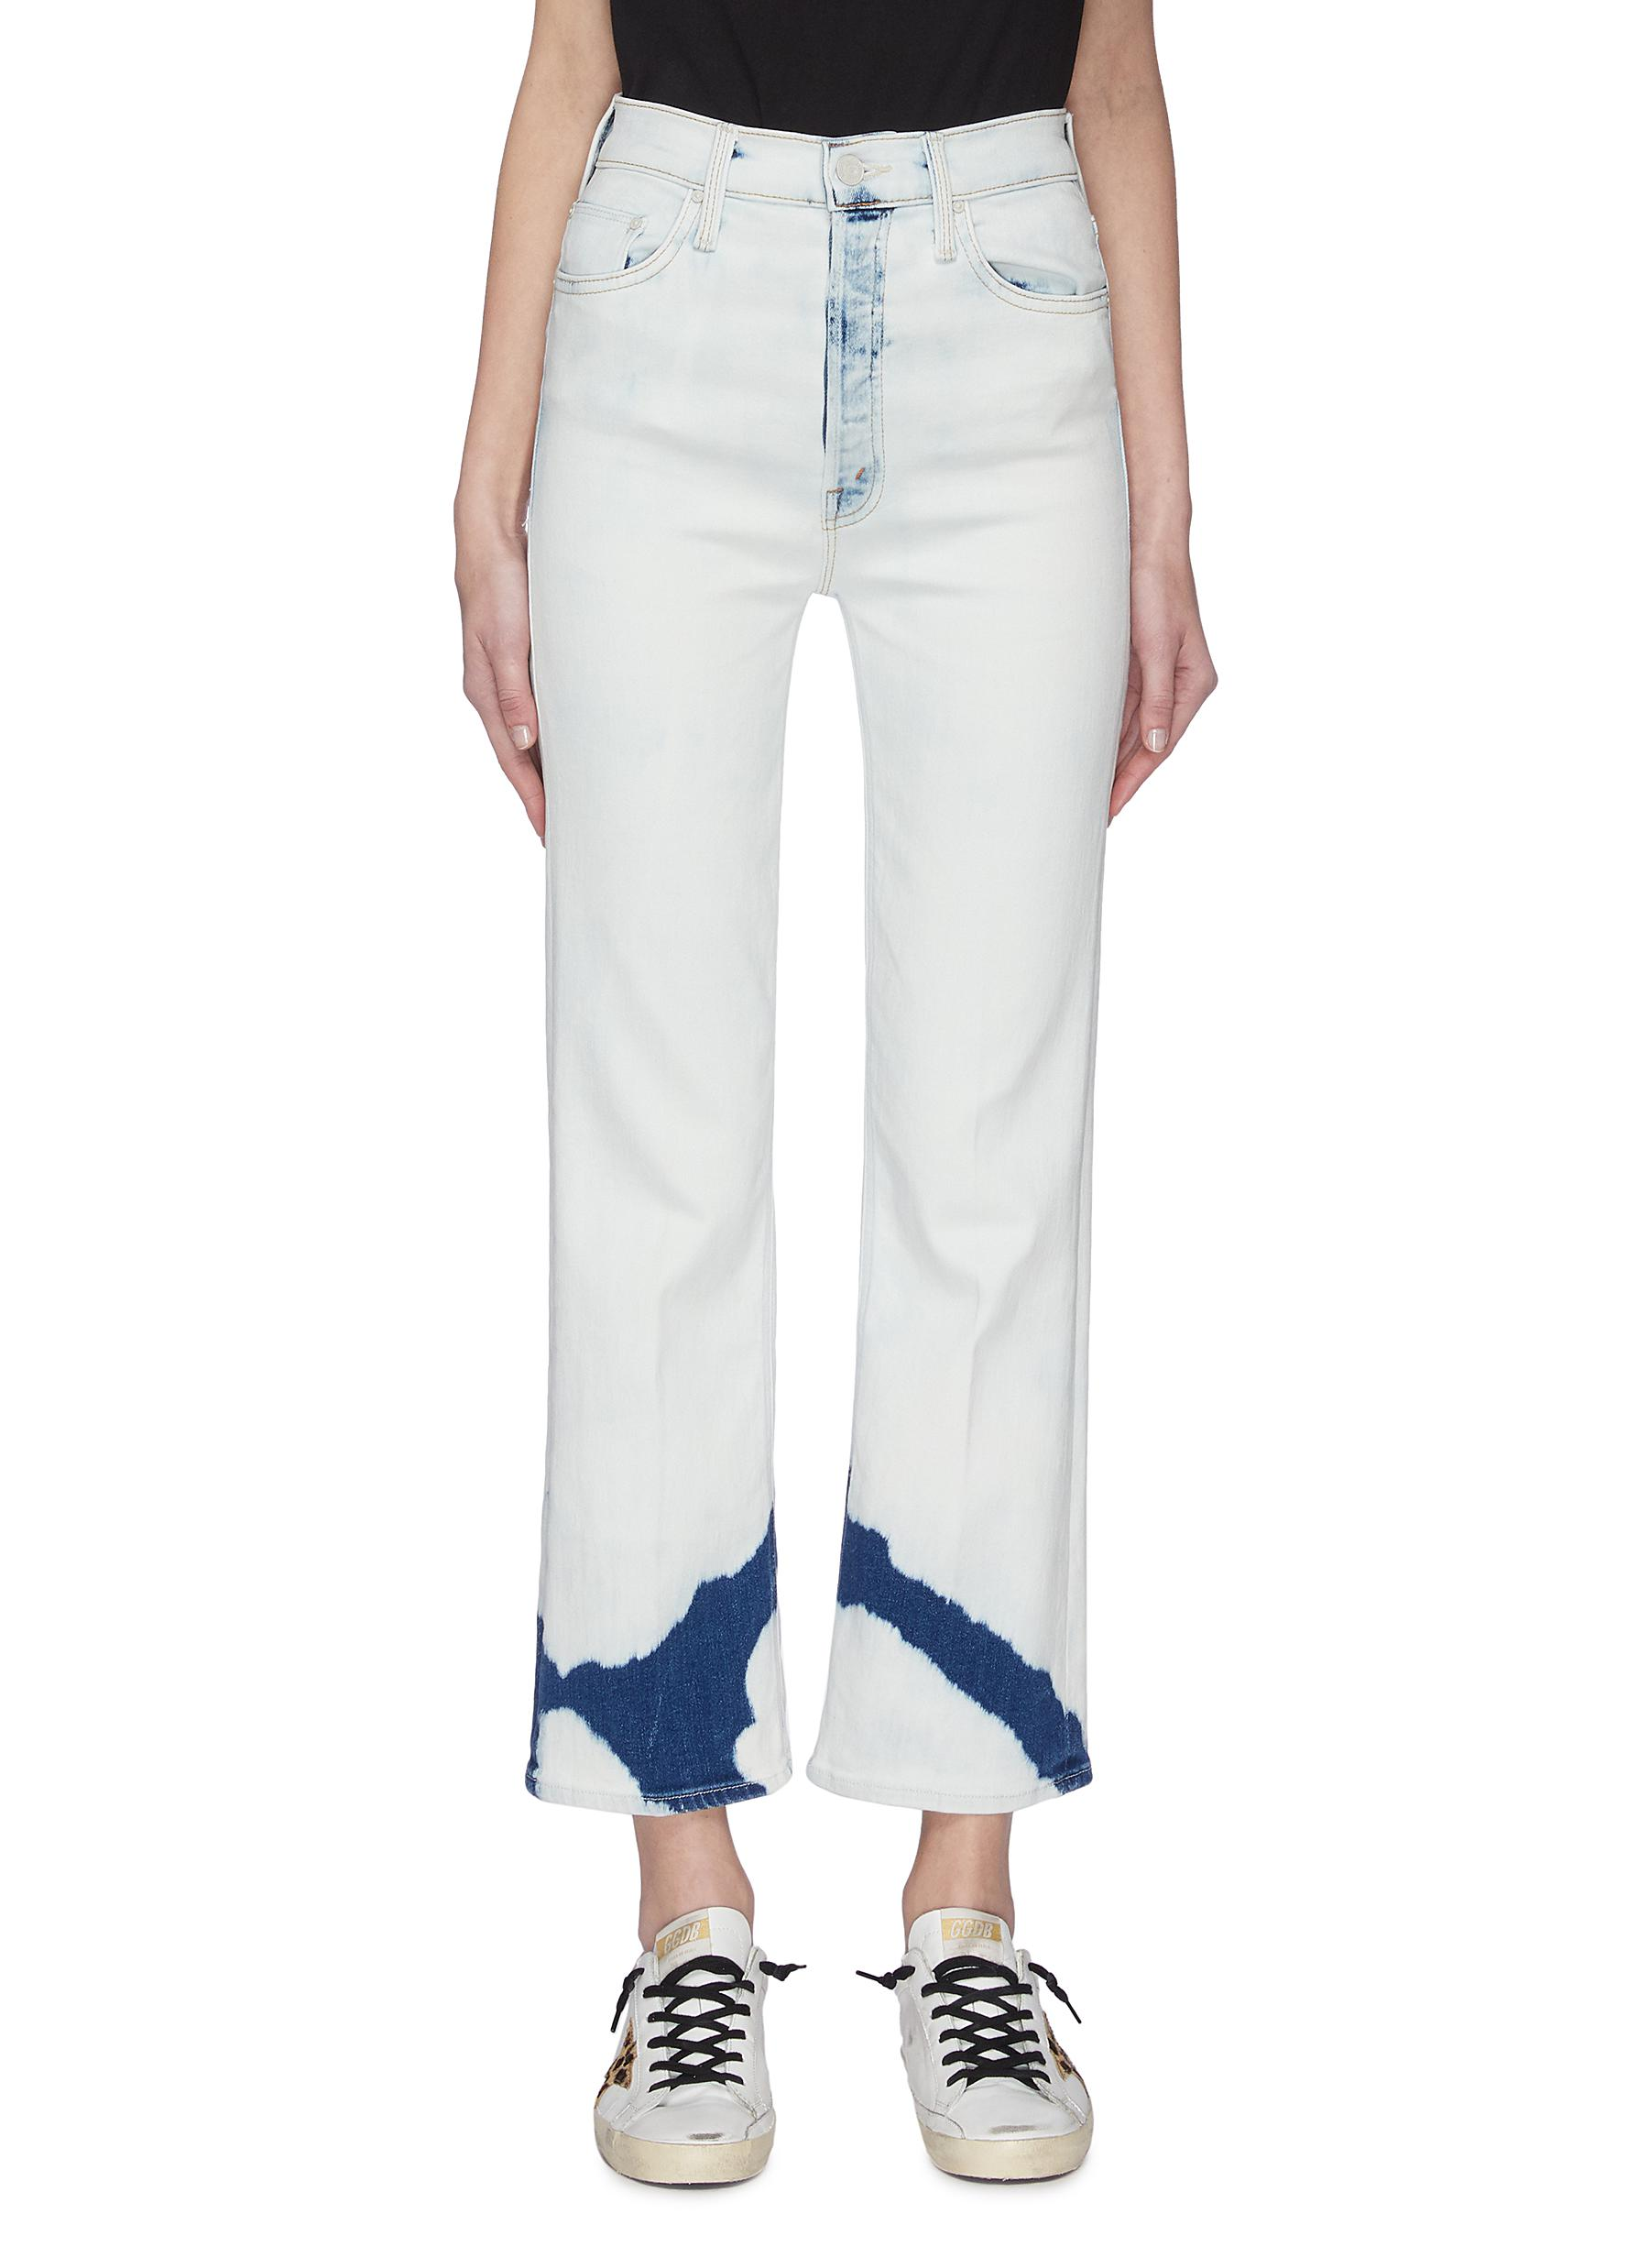 Buy Mother Jeans 'The Tripper Ankle' Tie-dye Jeans